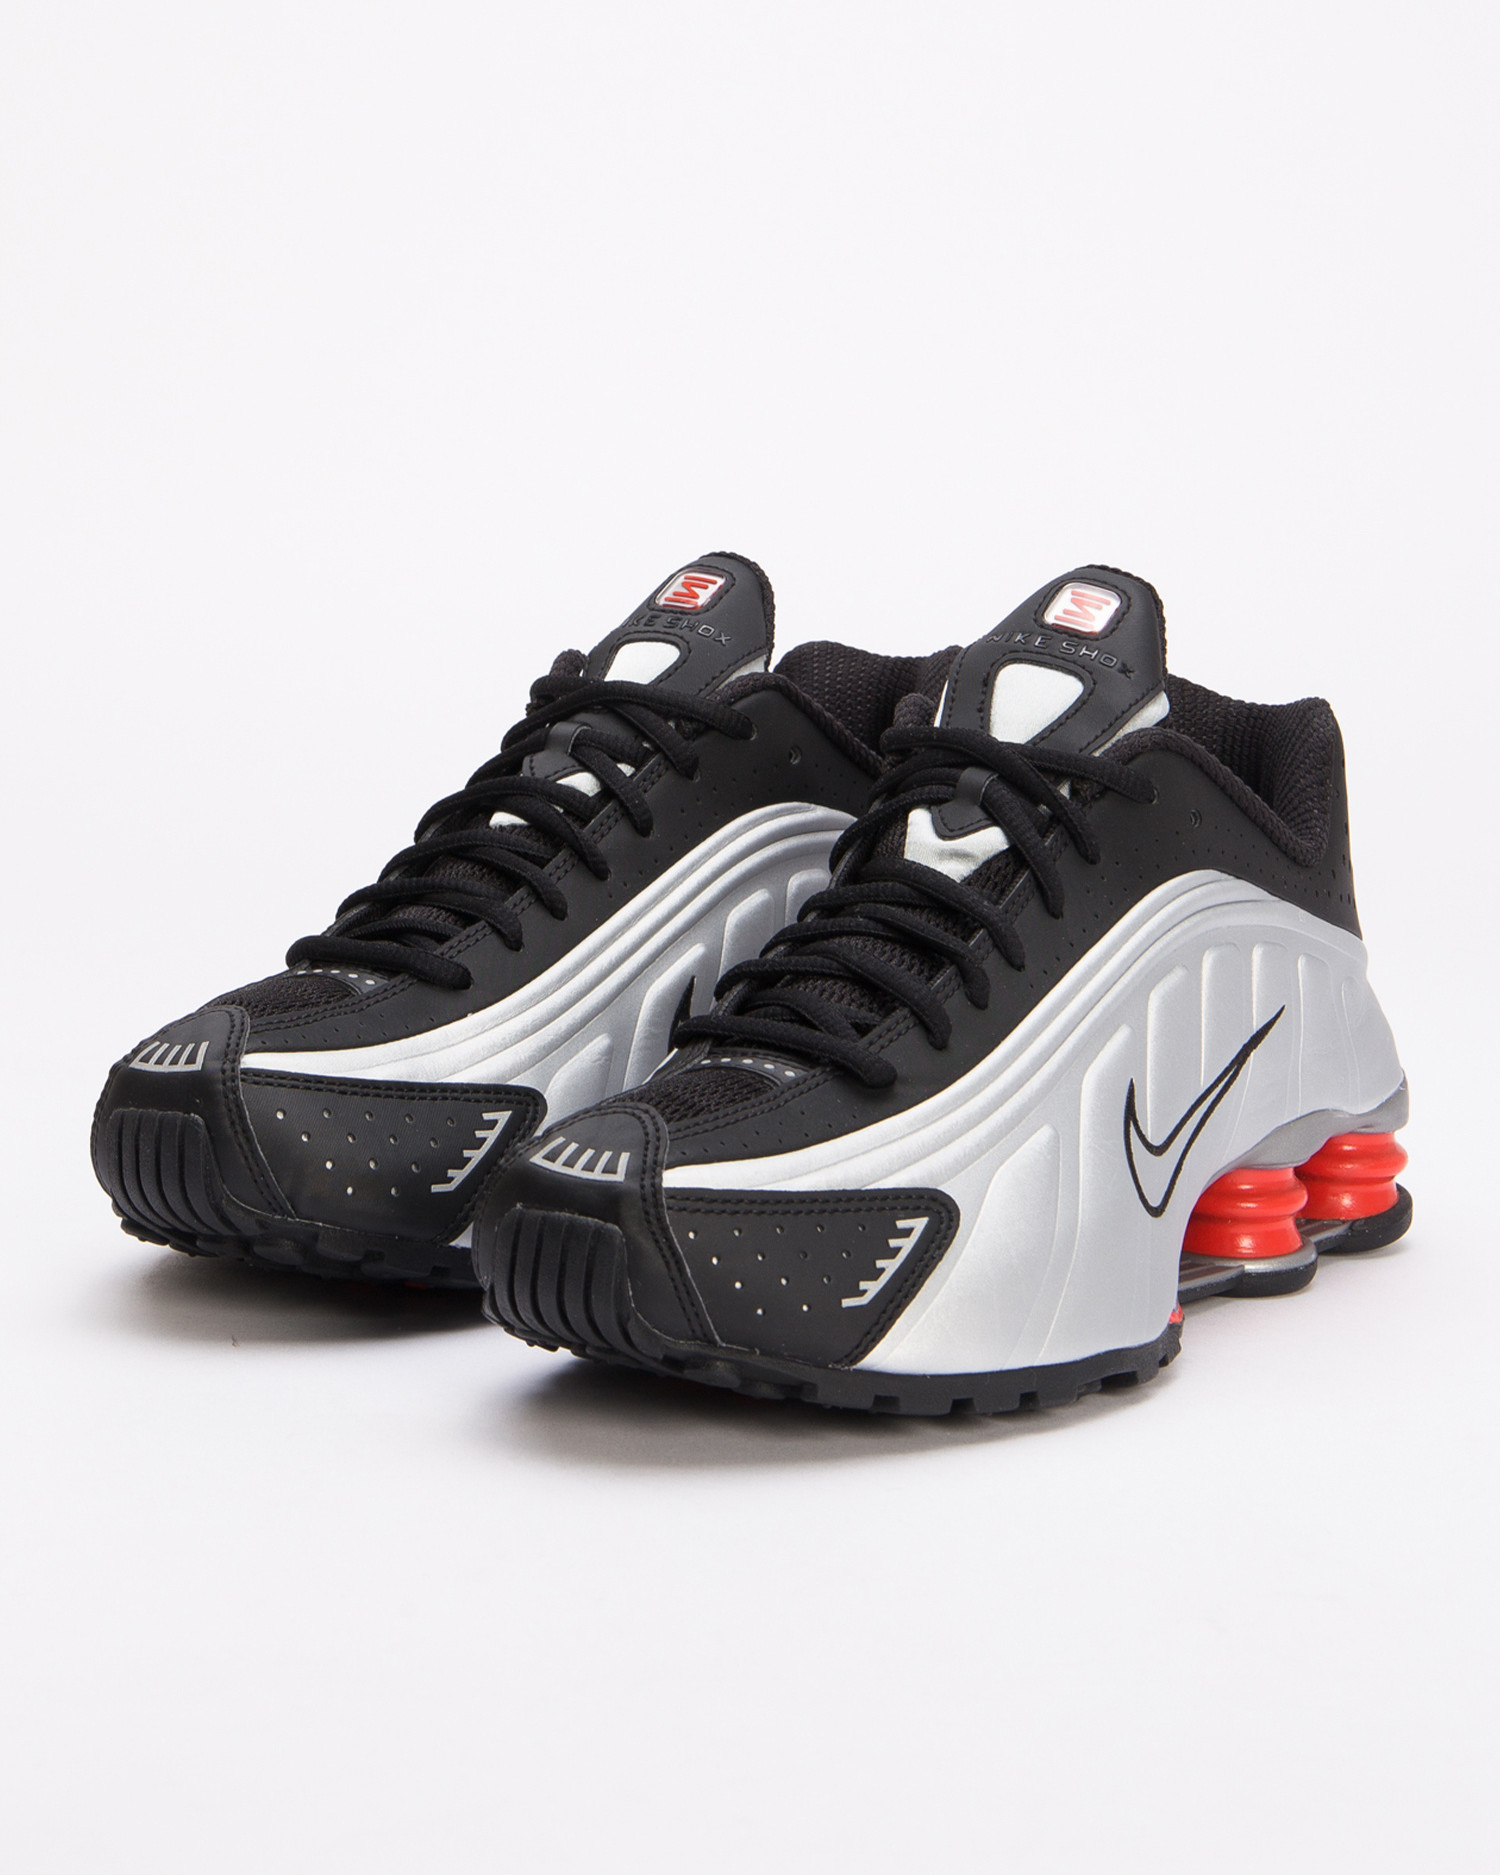 Nike Shox r4 Black/metallic silver-max orange